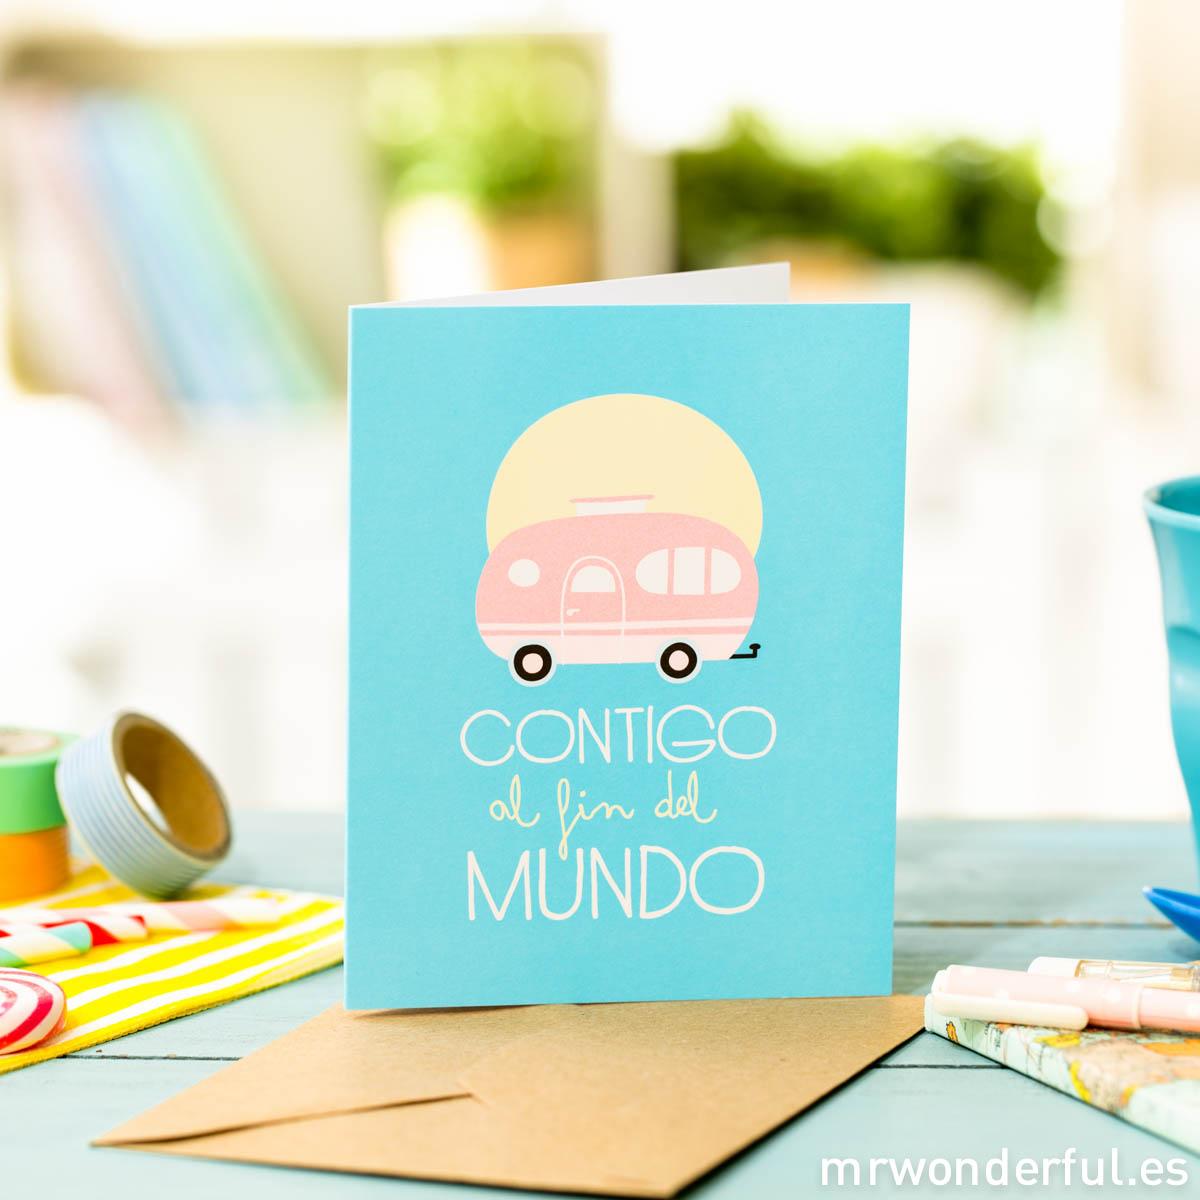 mrwonderful_TARJETAS-WONDER-51_Pack-surtido-felicitaciones-summer-castellano-1